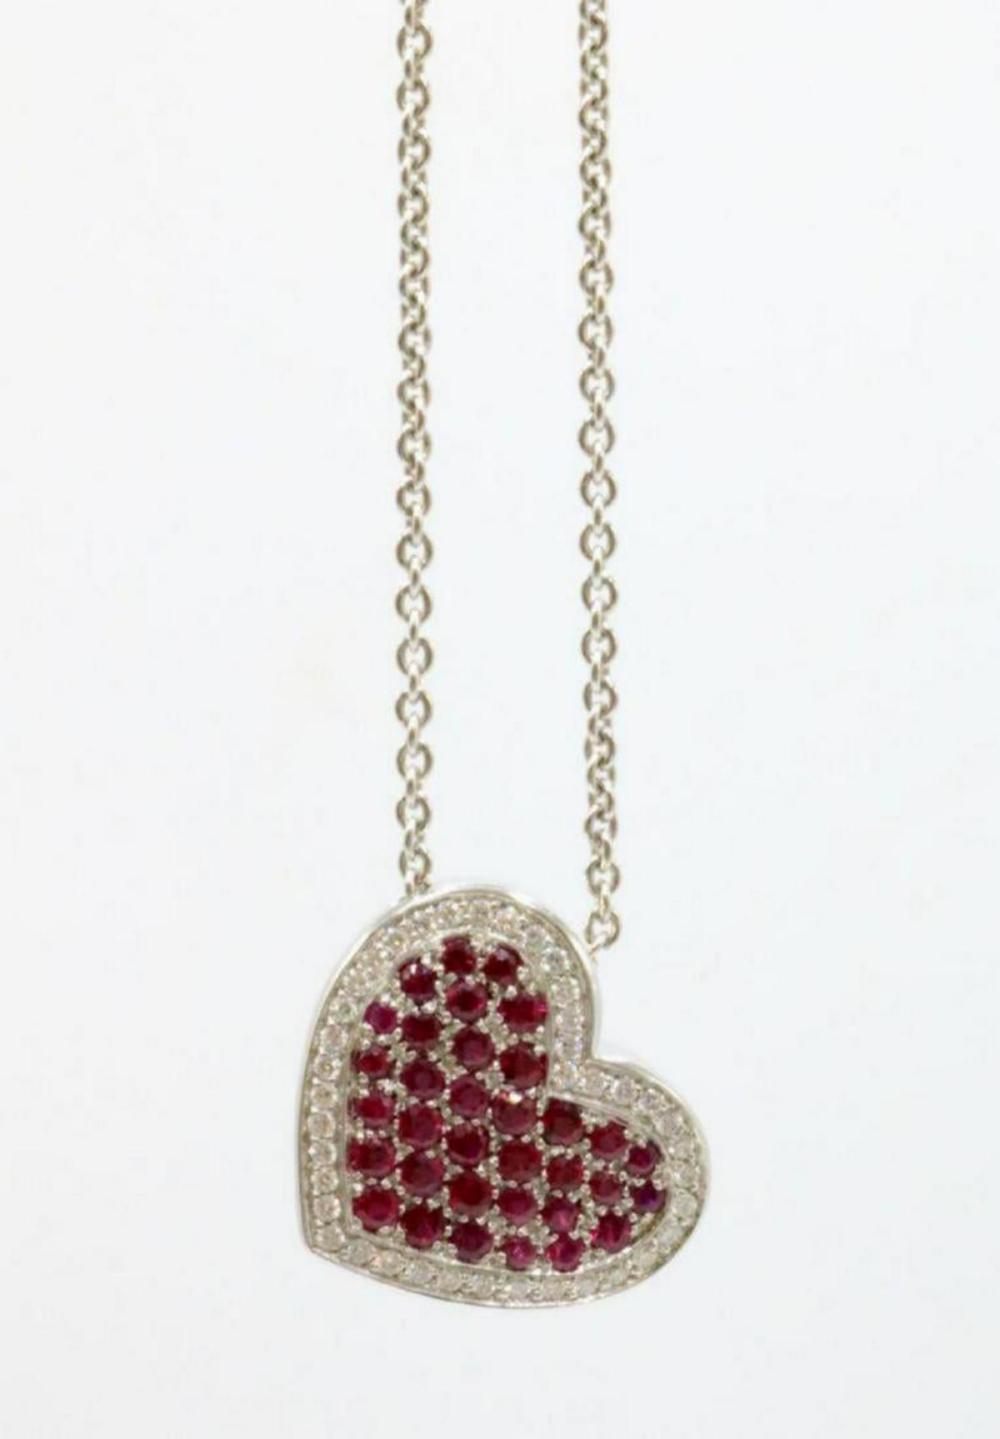 Birks 18Kt Ruby & Diamond Heart Pendant w/ Necklace